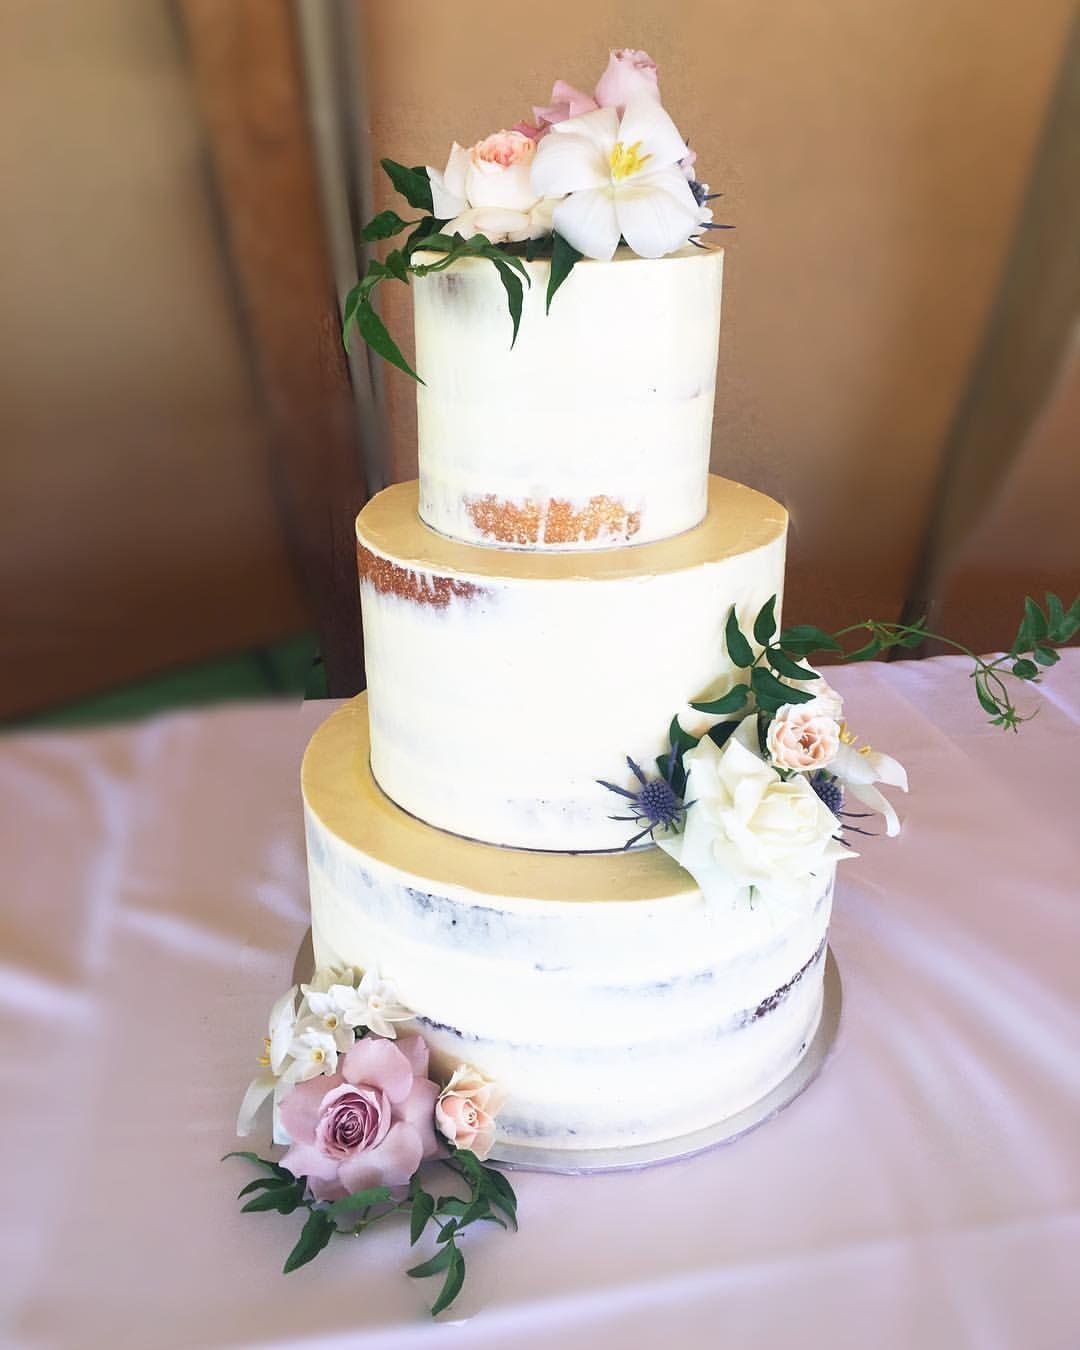 Semi Naked Cake Fresh Flowers Cake Wedding Cake 3 Tier